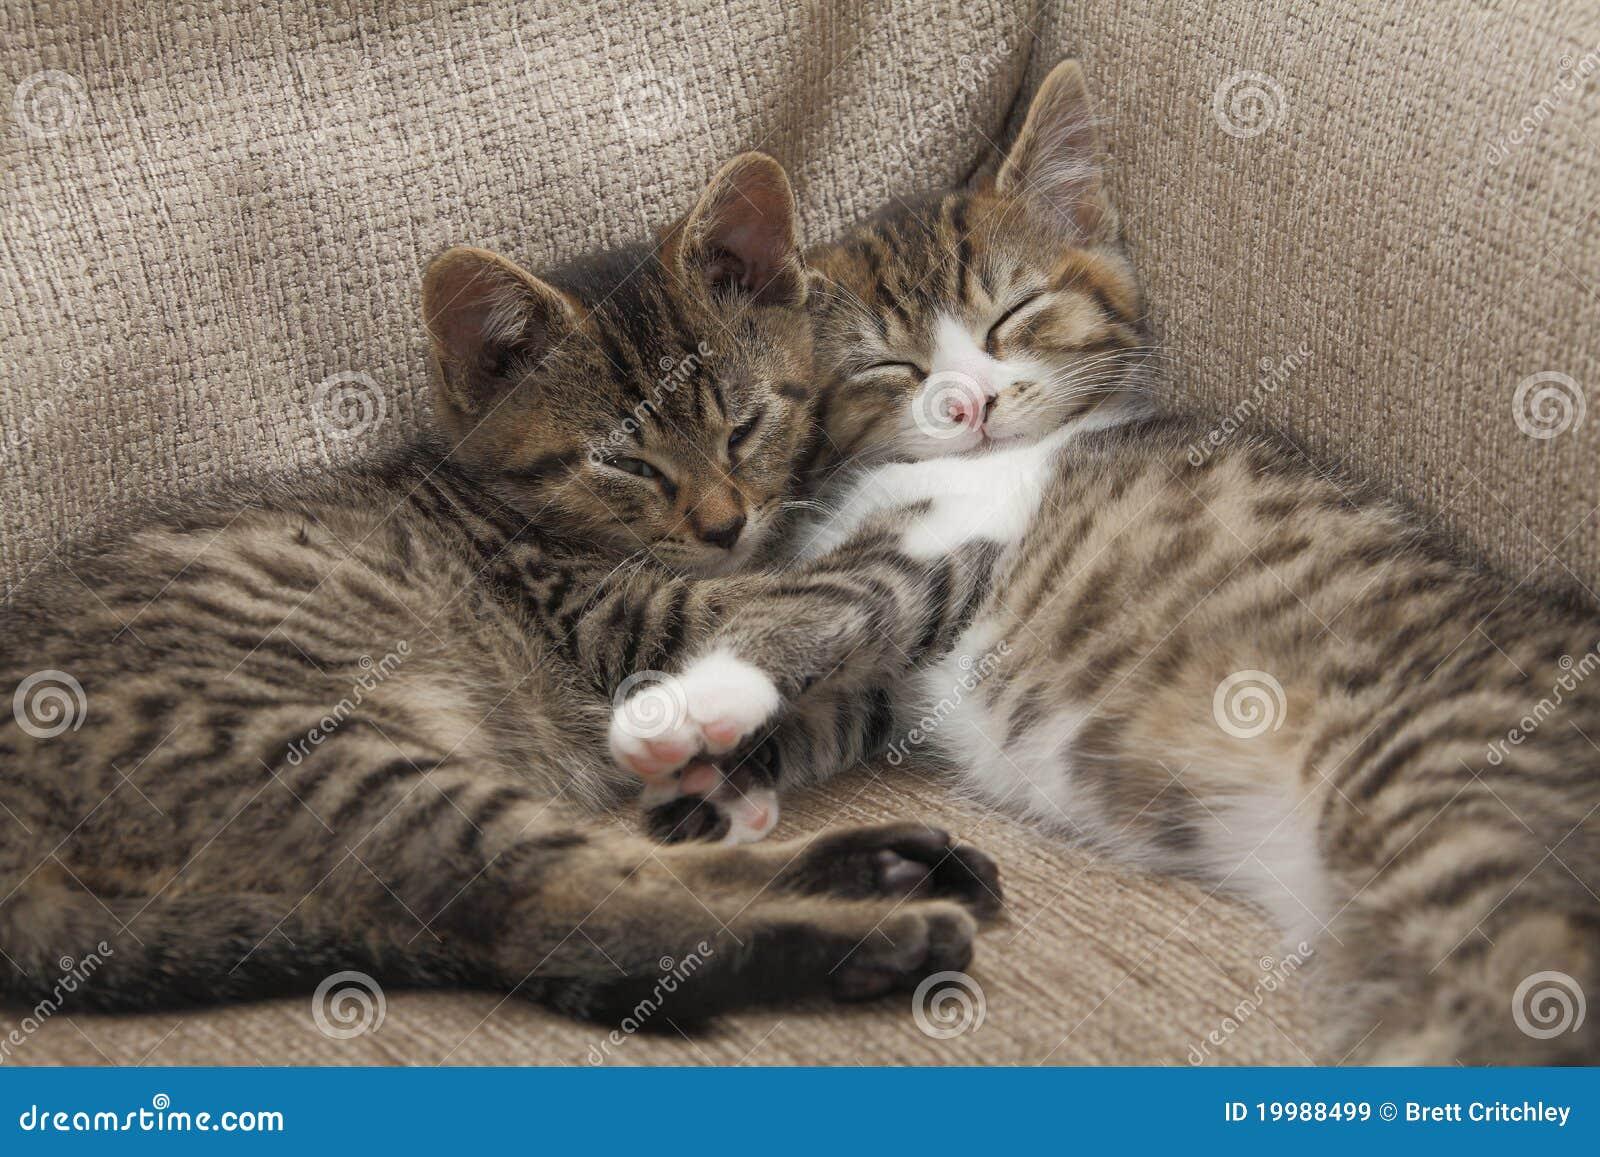 Sleeping tabby kittens stock image. Image of cute, forever - 27487069